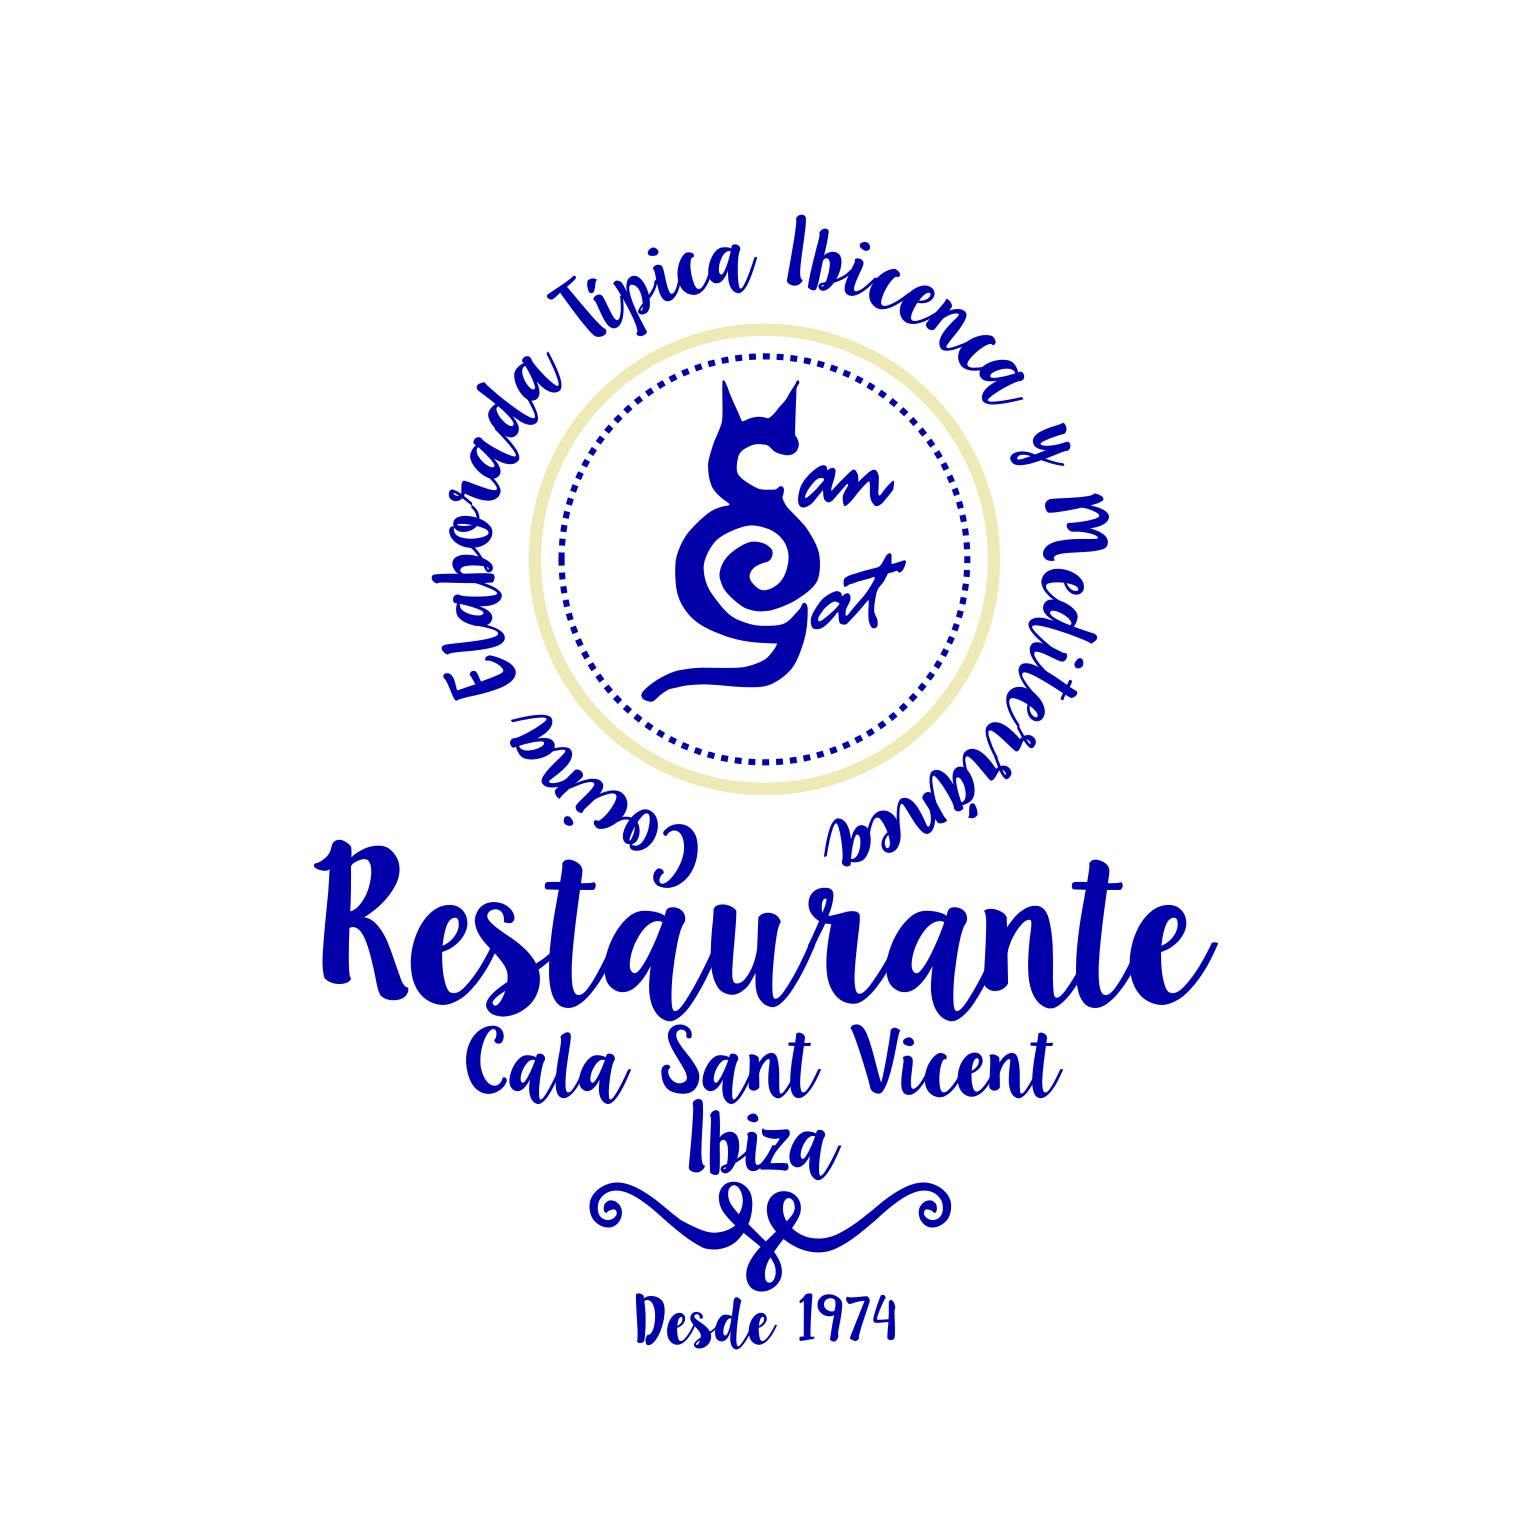 Restaurante Can Gat